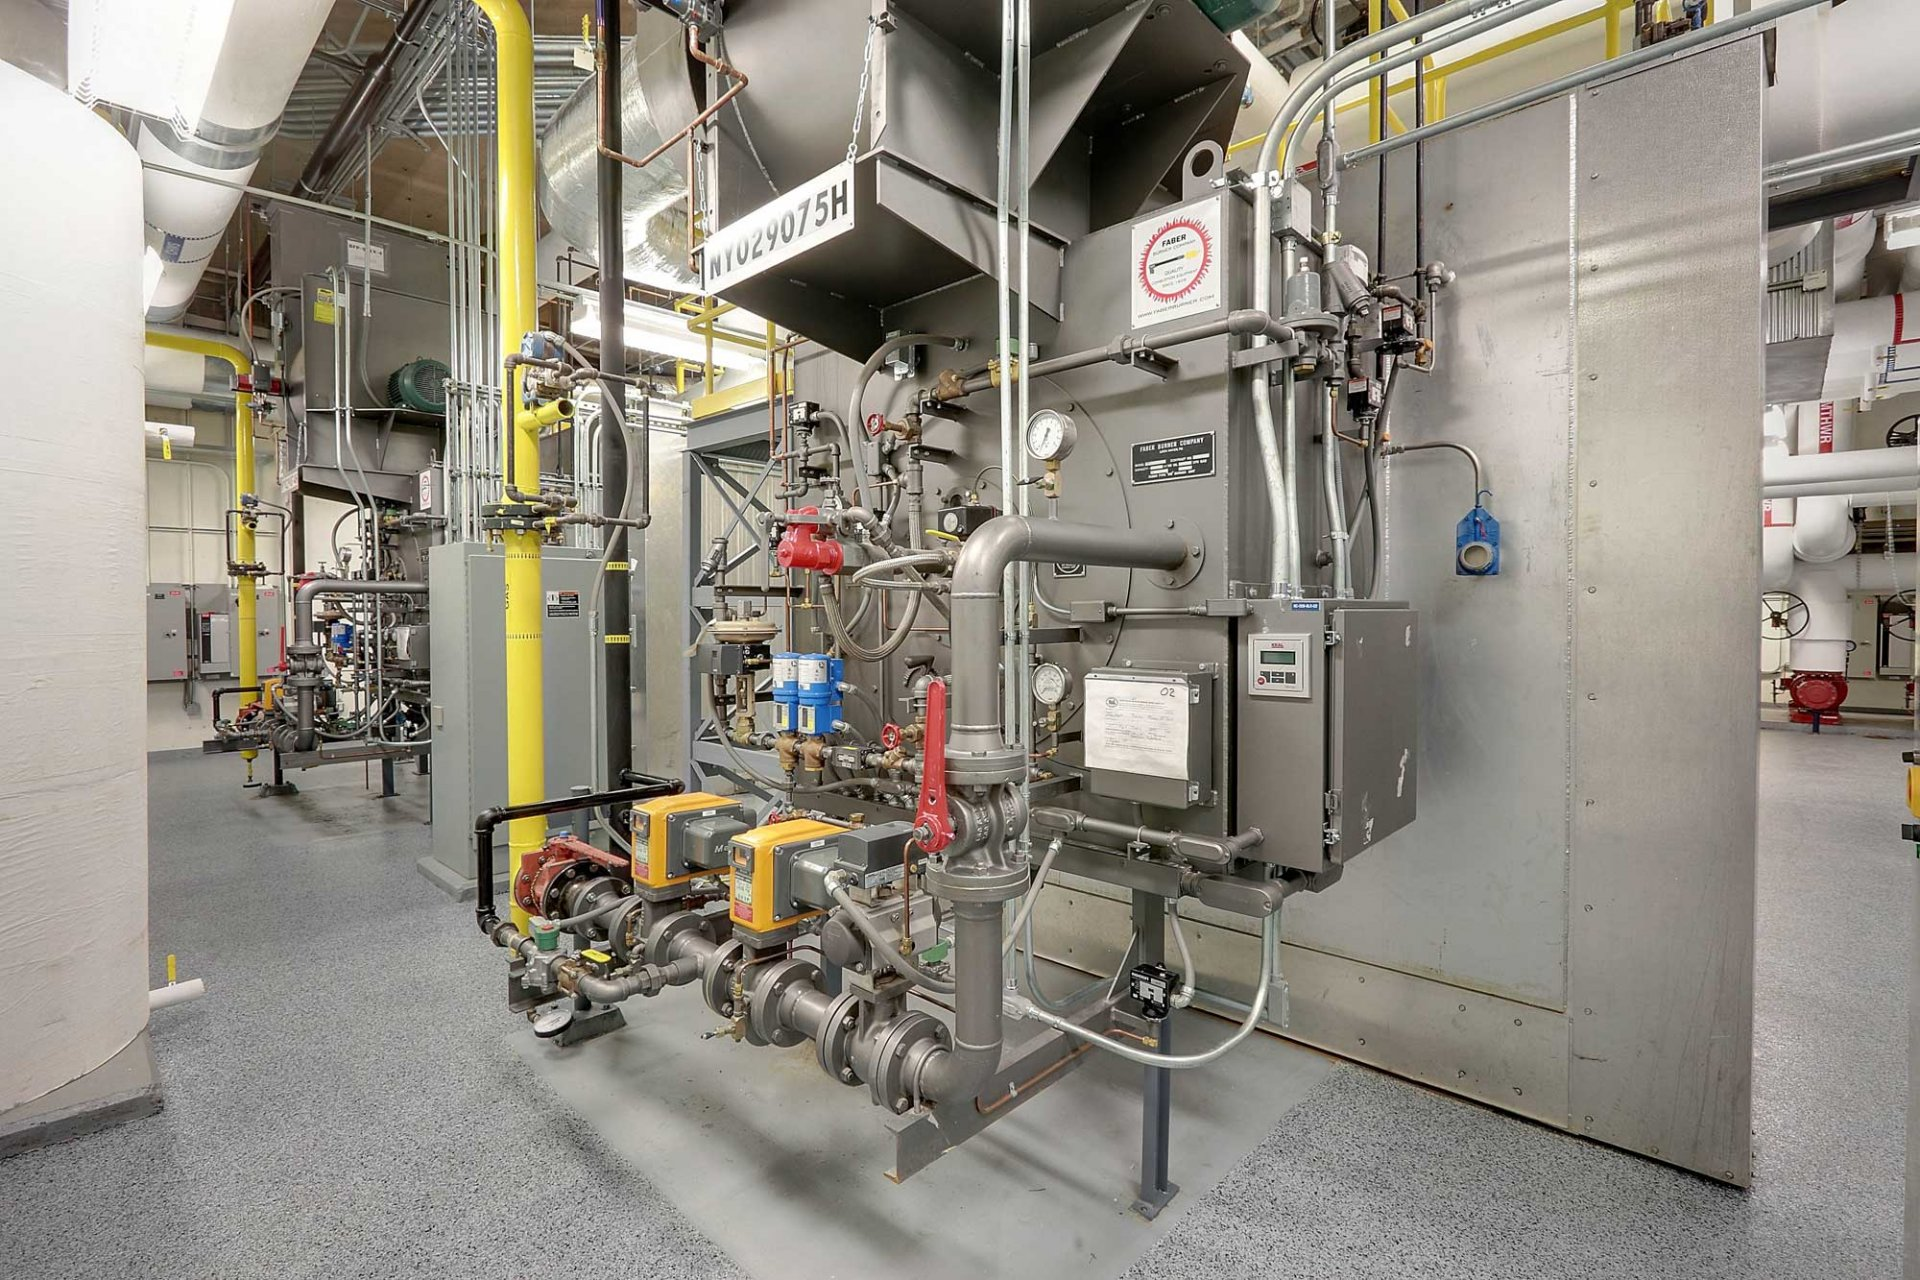 Engineering Forn Central Plants Central Chiller Boiler